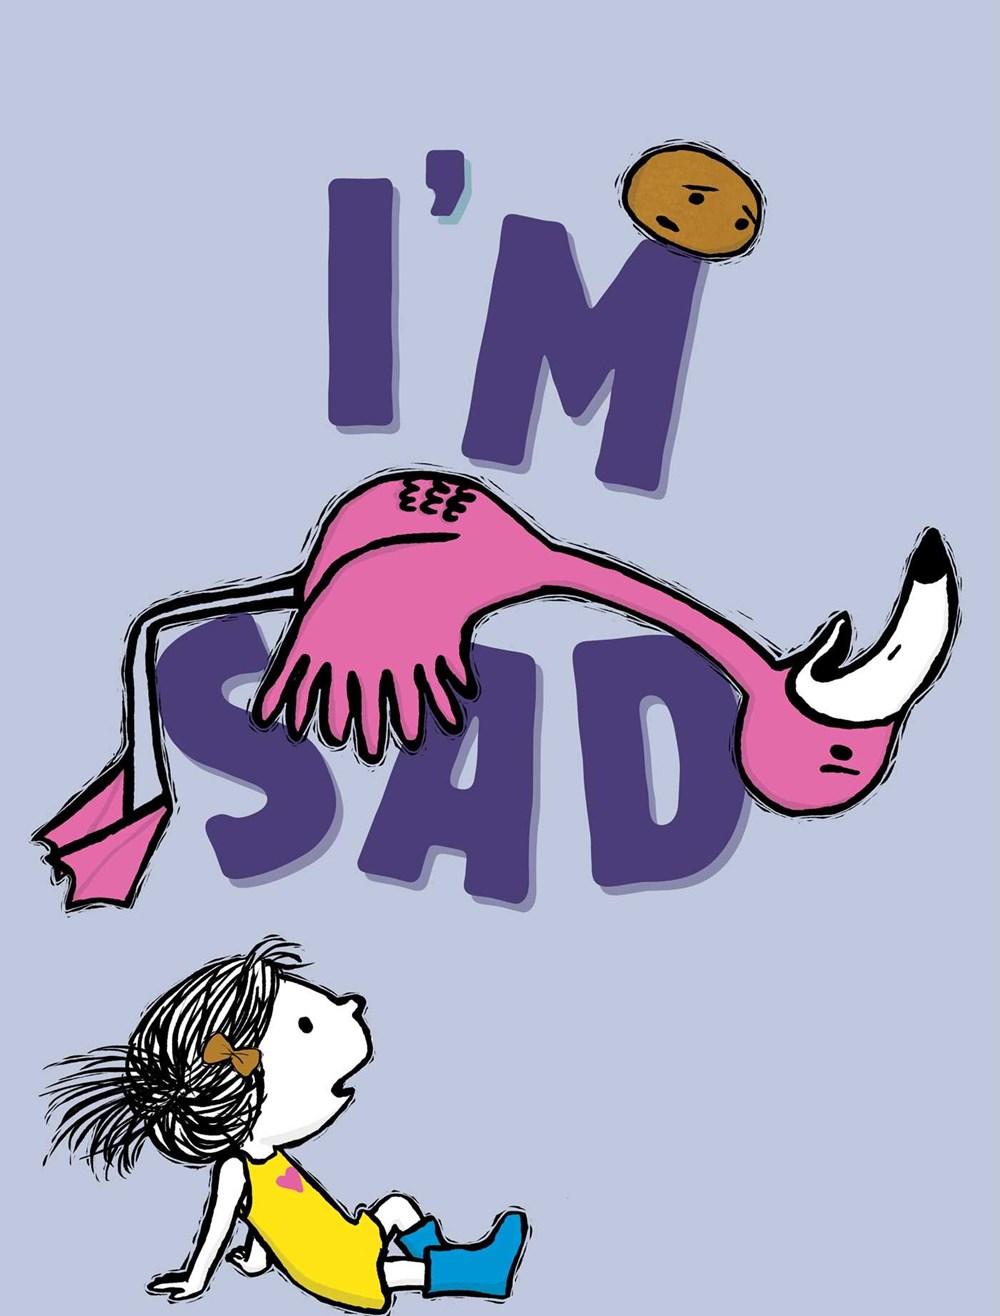 Kids' Book Launch: I'M SAD by Michael Ian Black & Debbie Ridpath Ohi